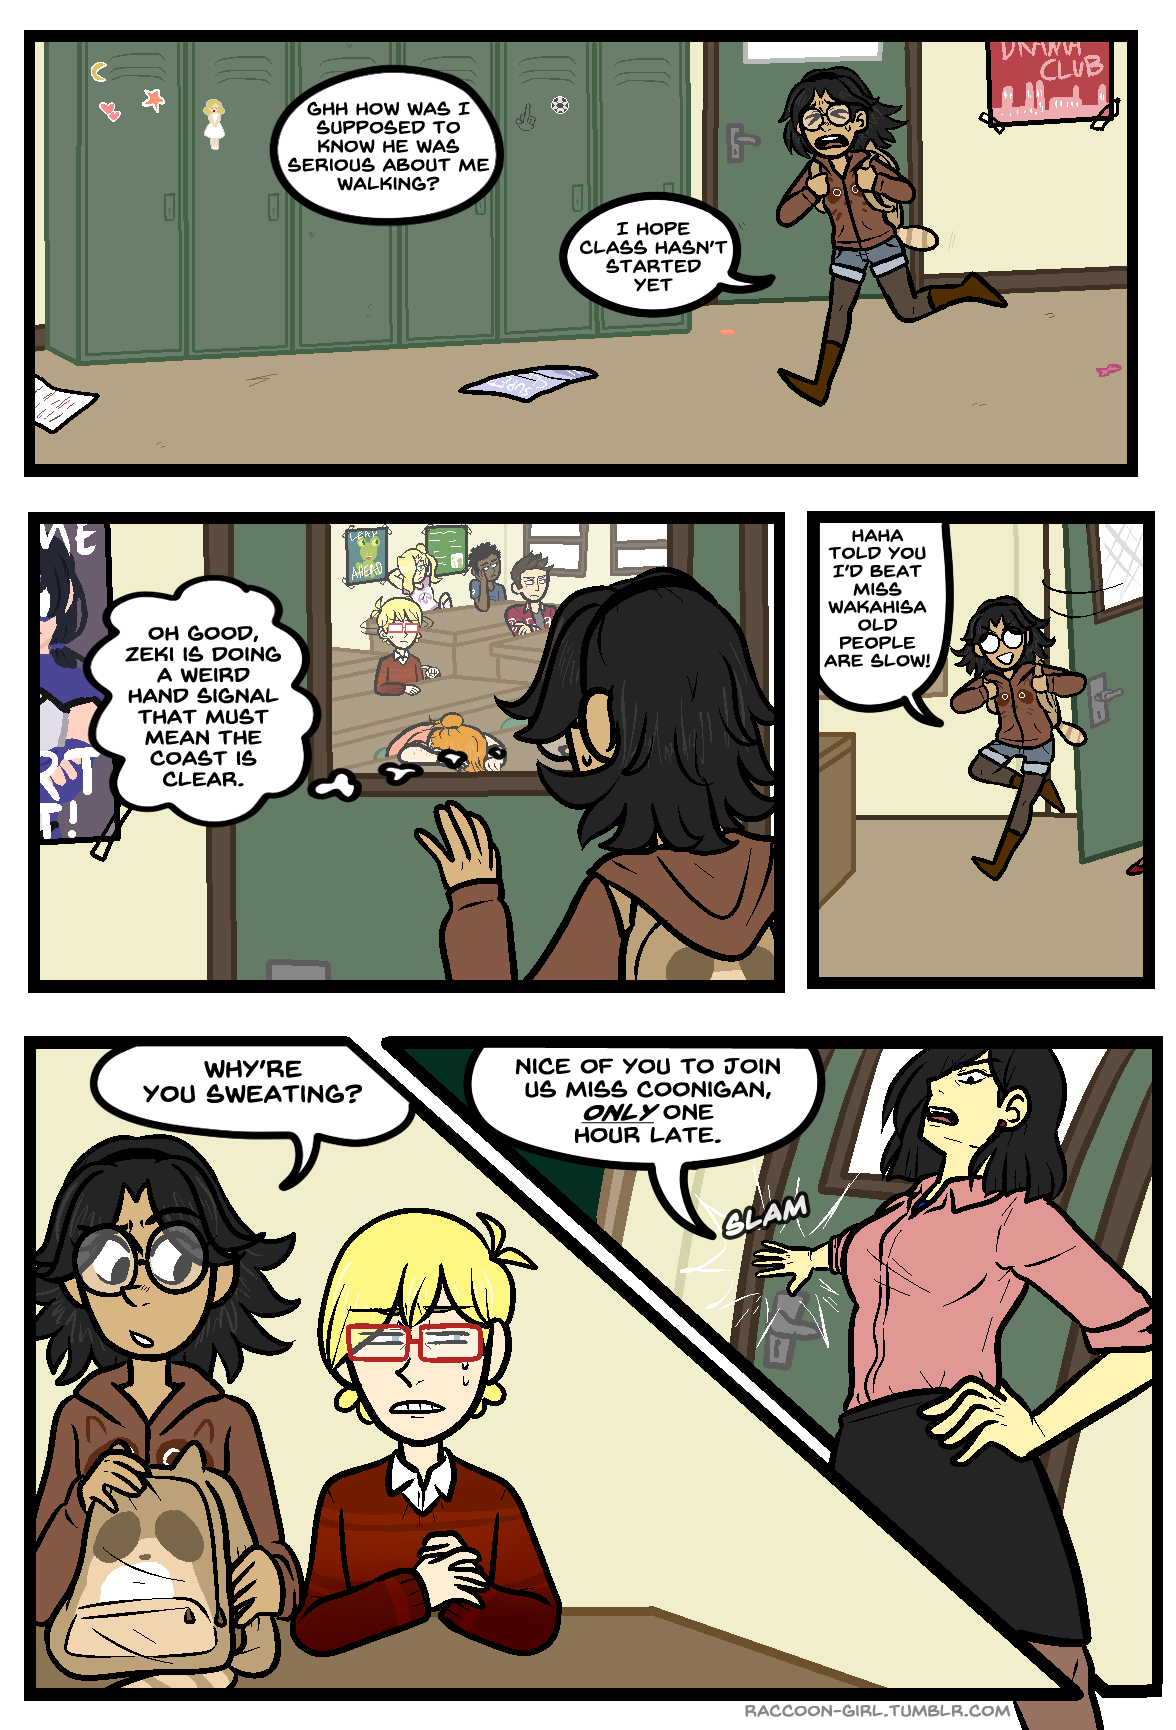 raccoongirl-page54